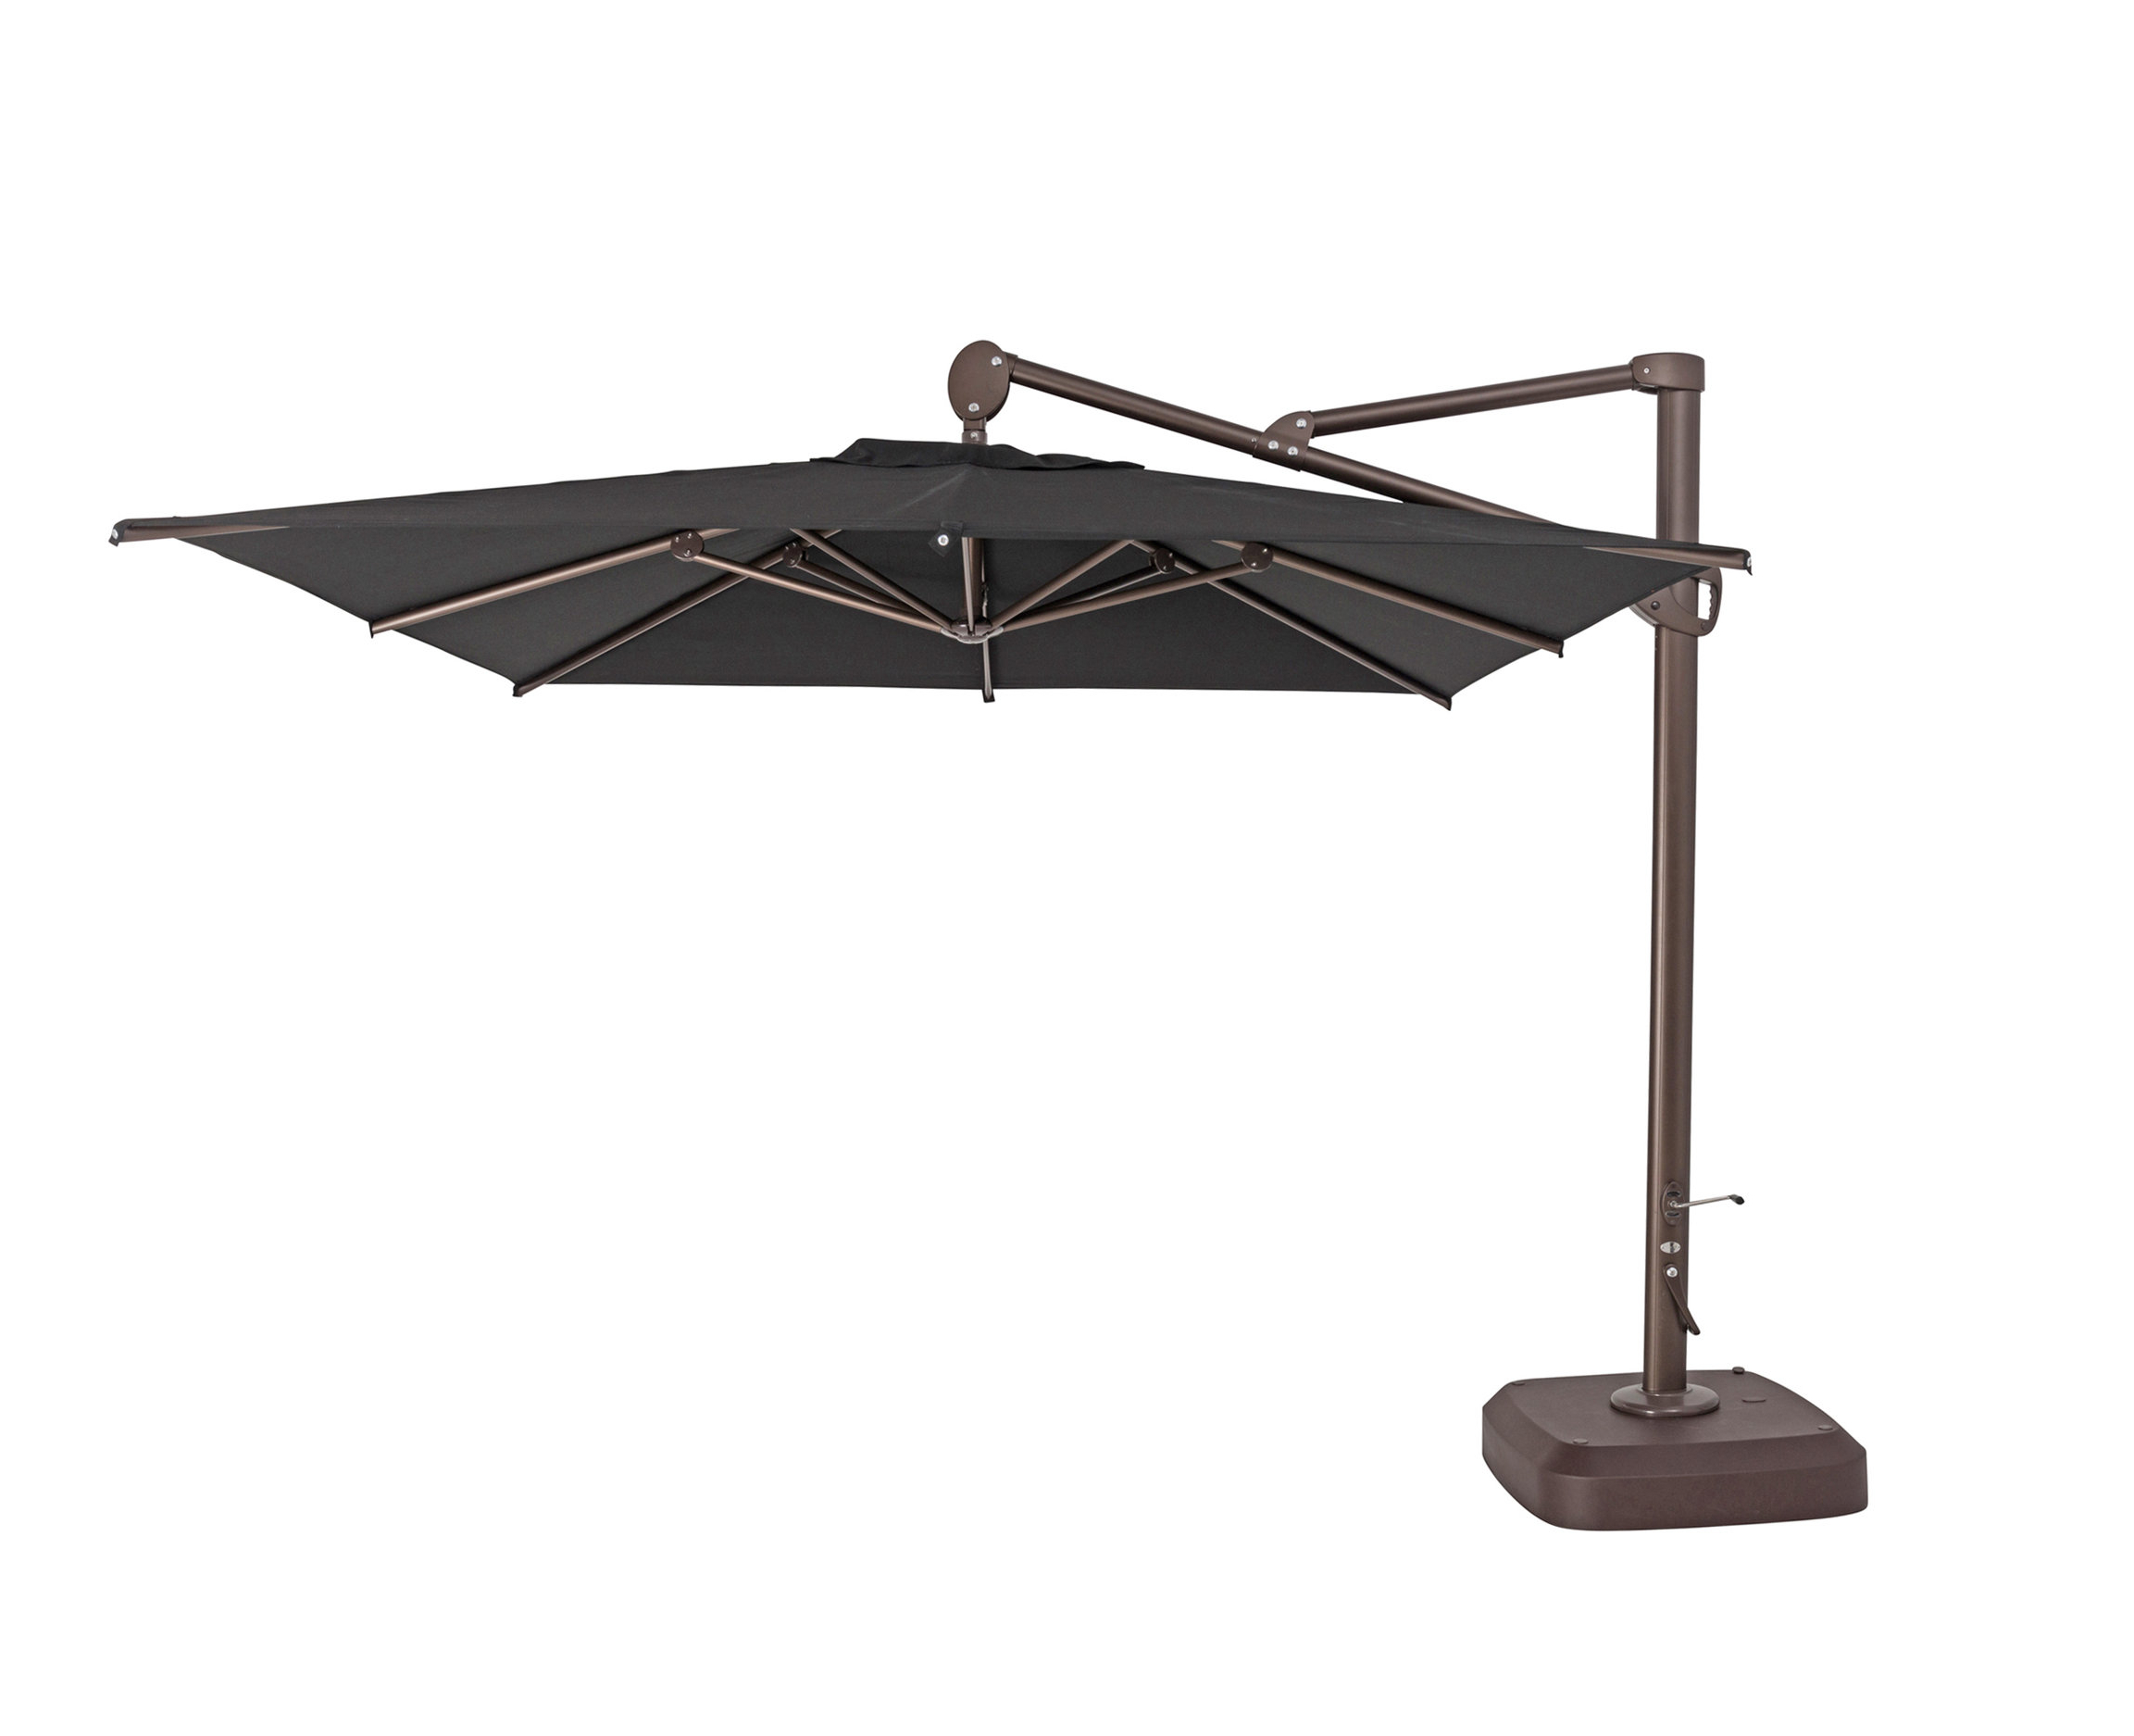 Most Current Olen Cantilever Umbrellas Regarding 10' Square Cantilever Umbrella (Gallery 5 of 20)